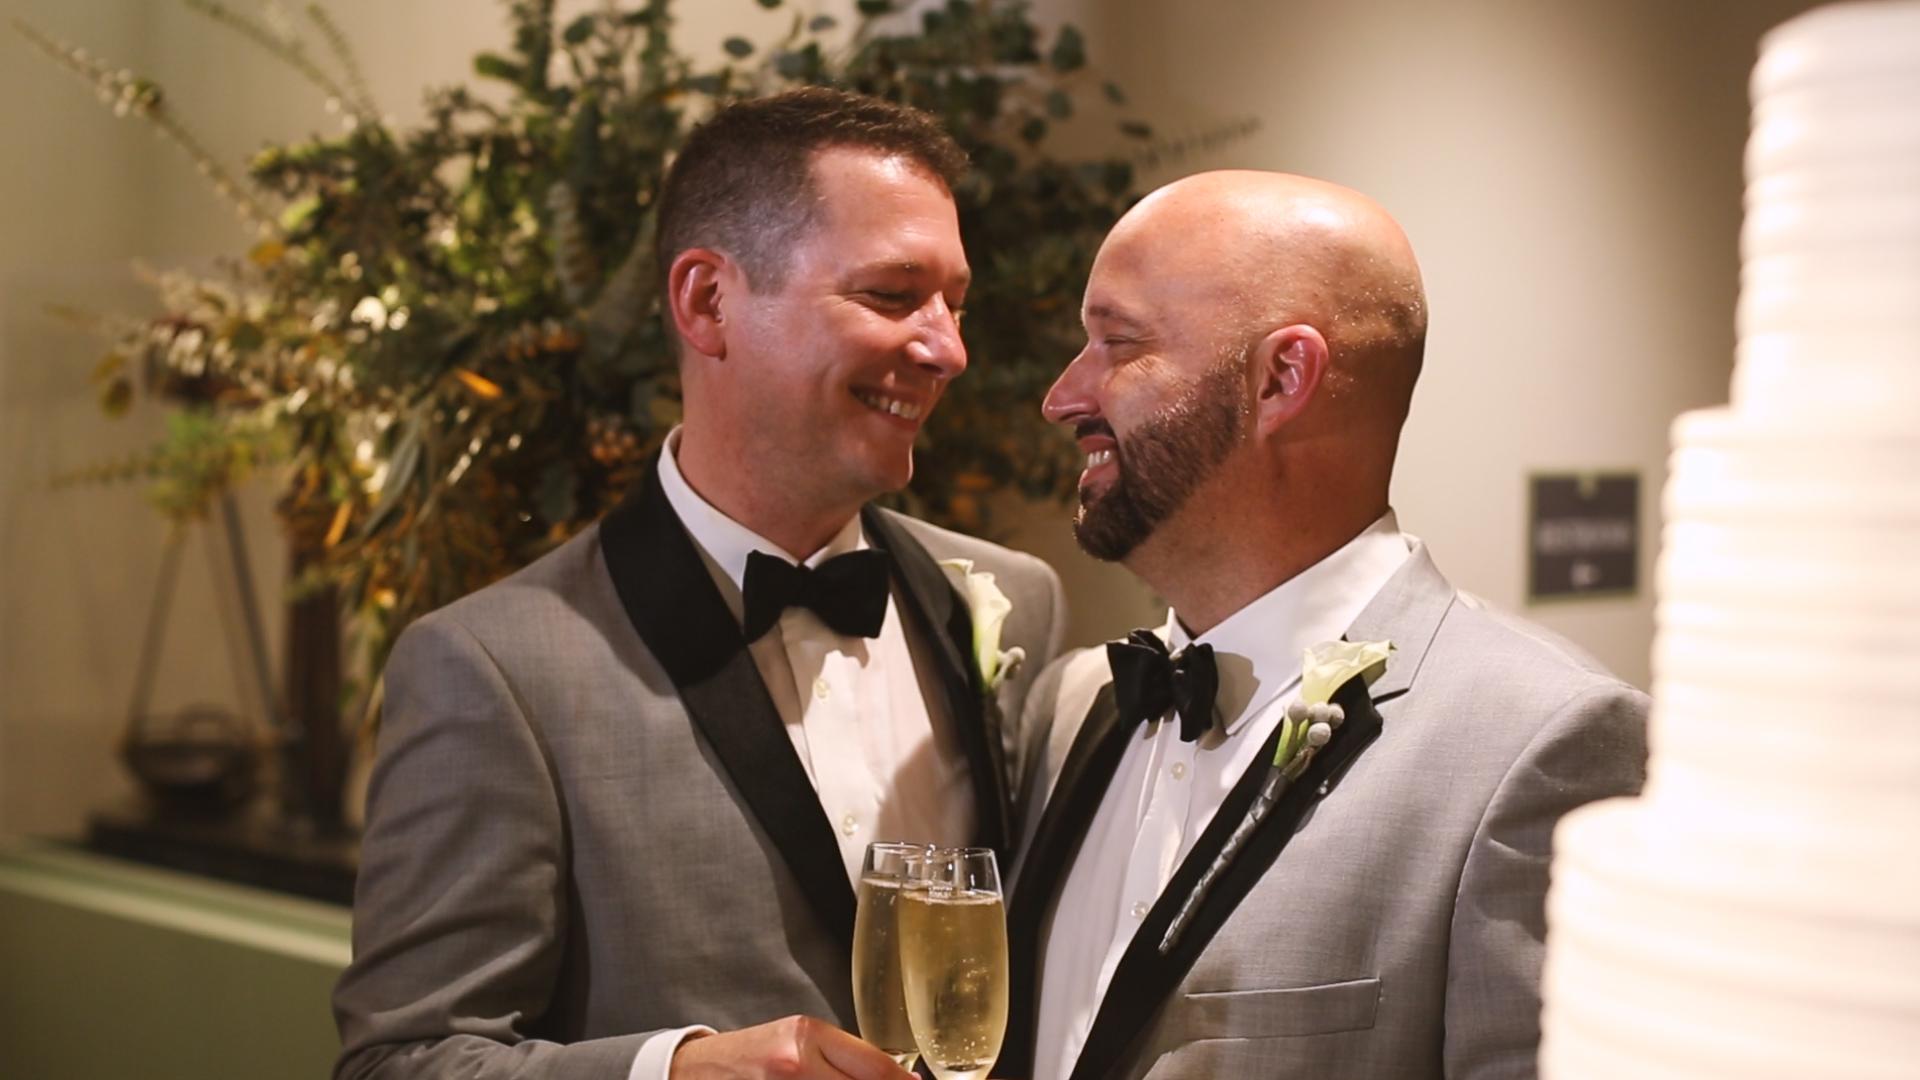 Haydels Wedding Cake - Bride Film